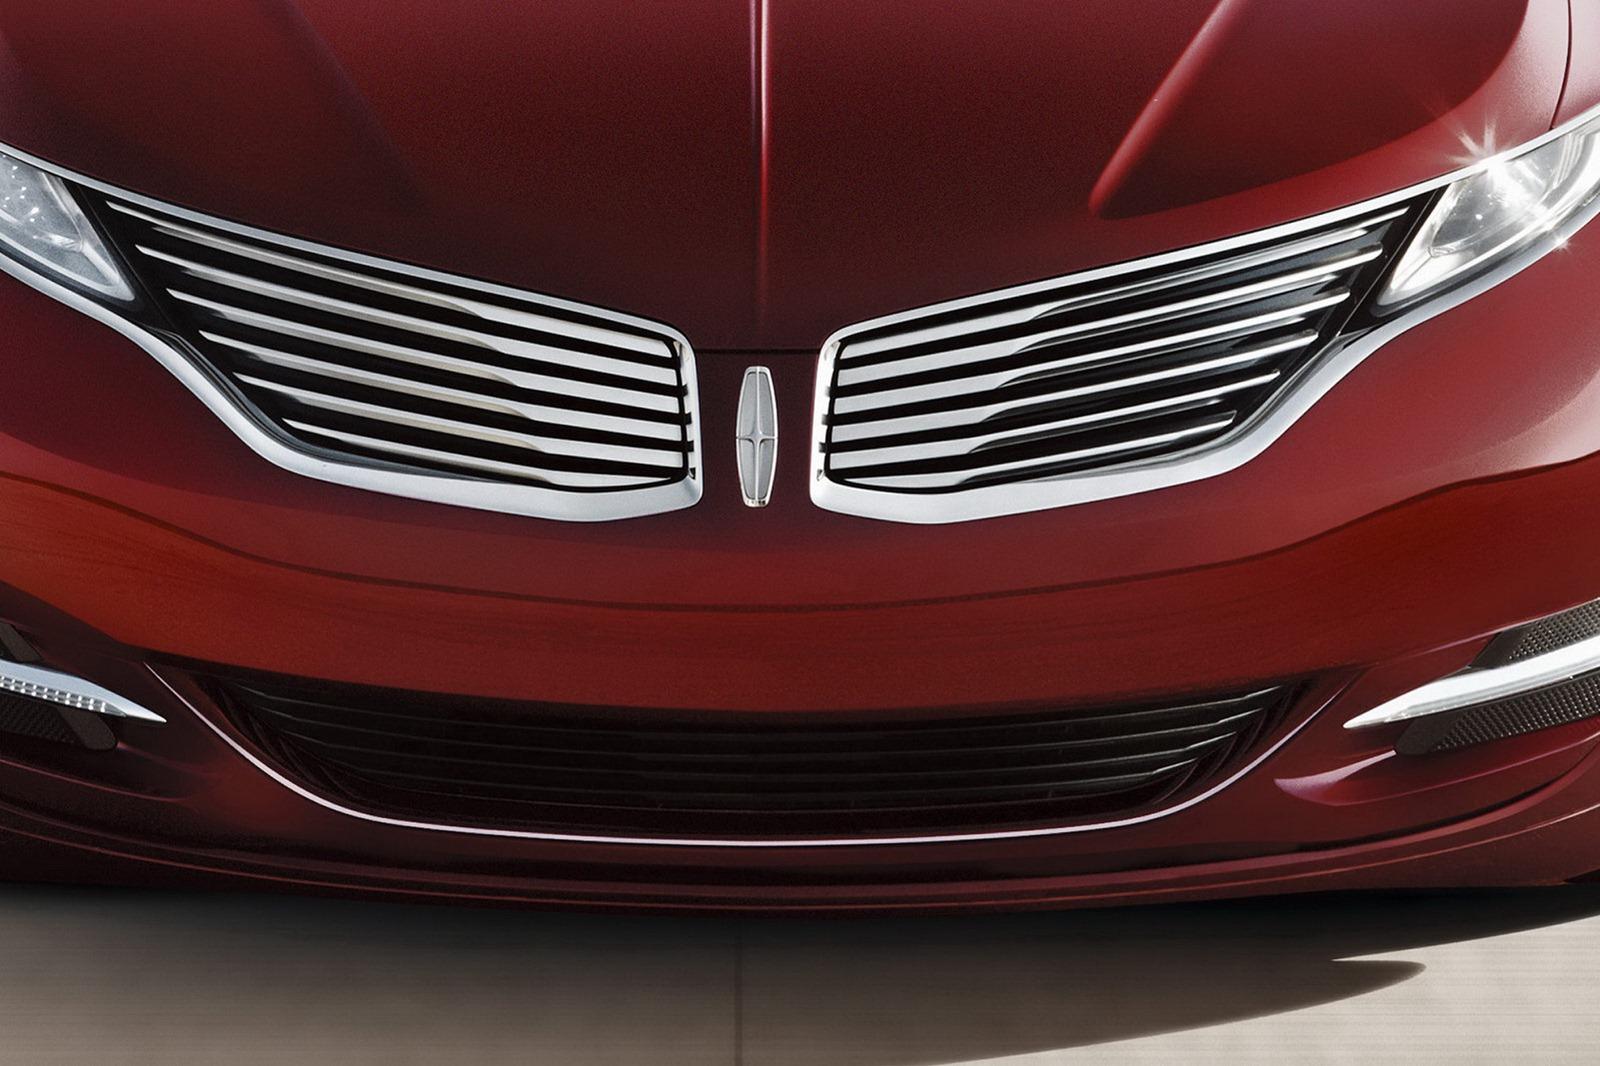 http://lh4.ggpht.com/-ryCHDuF6-5o/TwvShhhqc7I/AAAAAAAGWmw/V8vSiwkxSZg/s1600/Lincoln-MKZ-Concept-21%25255B2%25255D.jpg